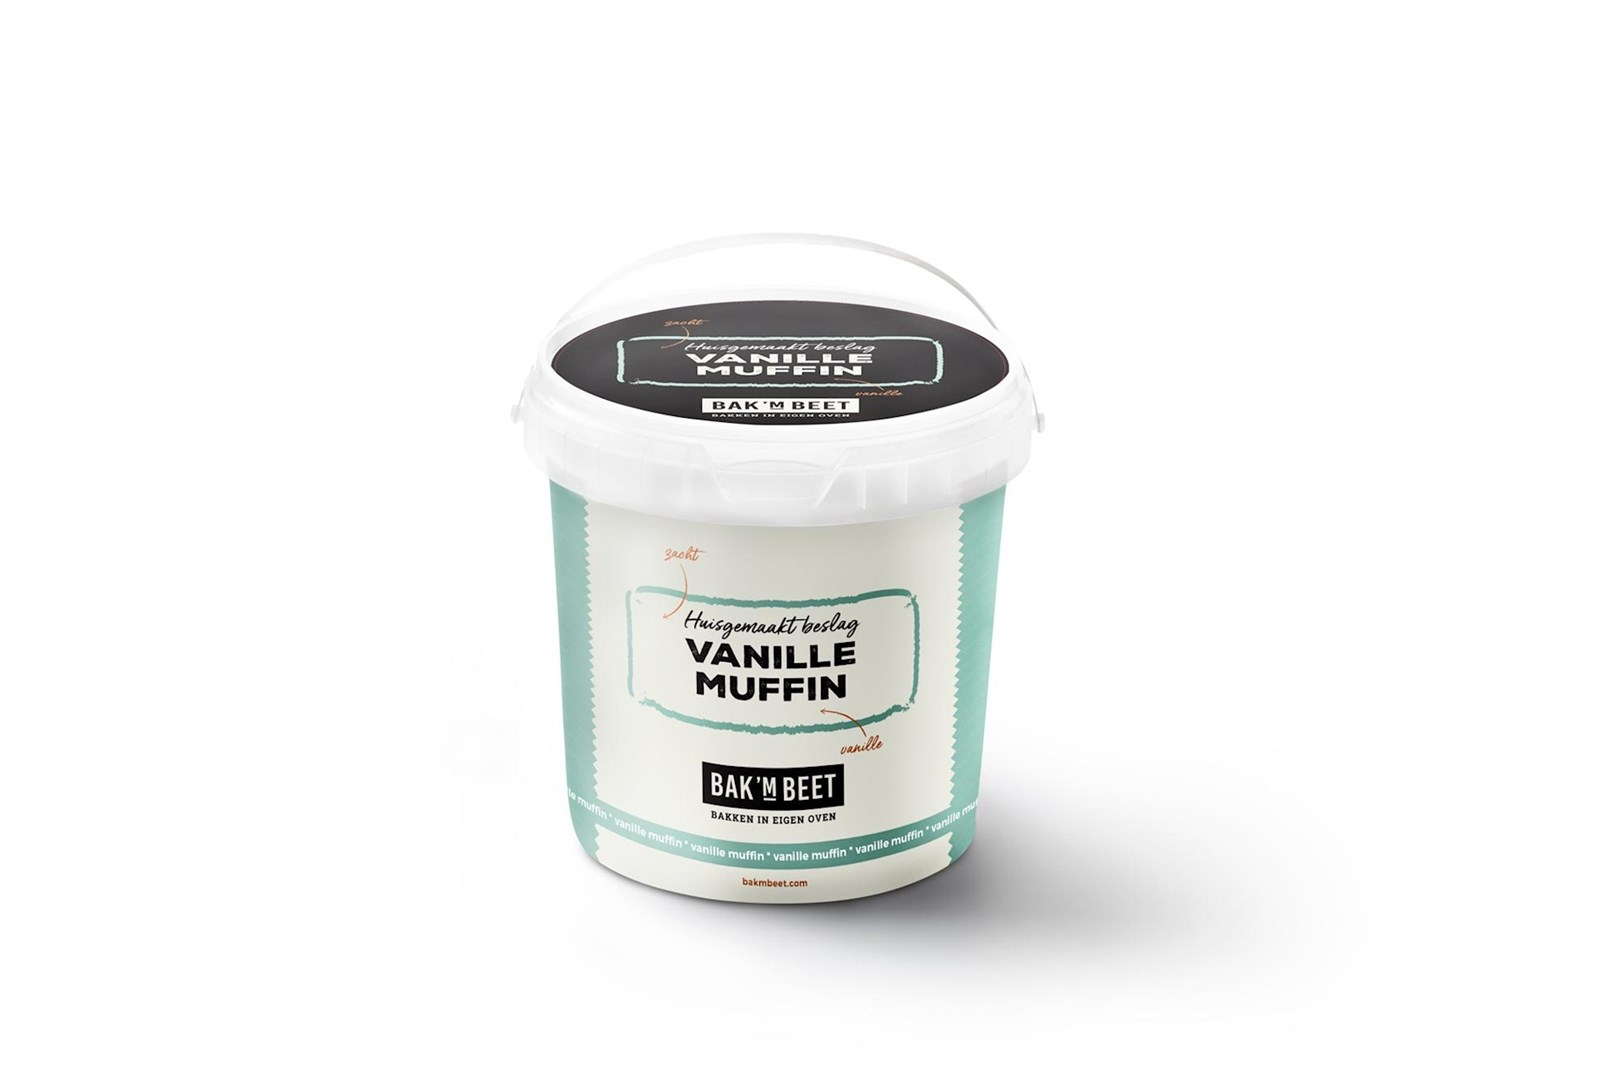 Productafbeelding Vanille muffin Bak 'm beet 1 kg